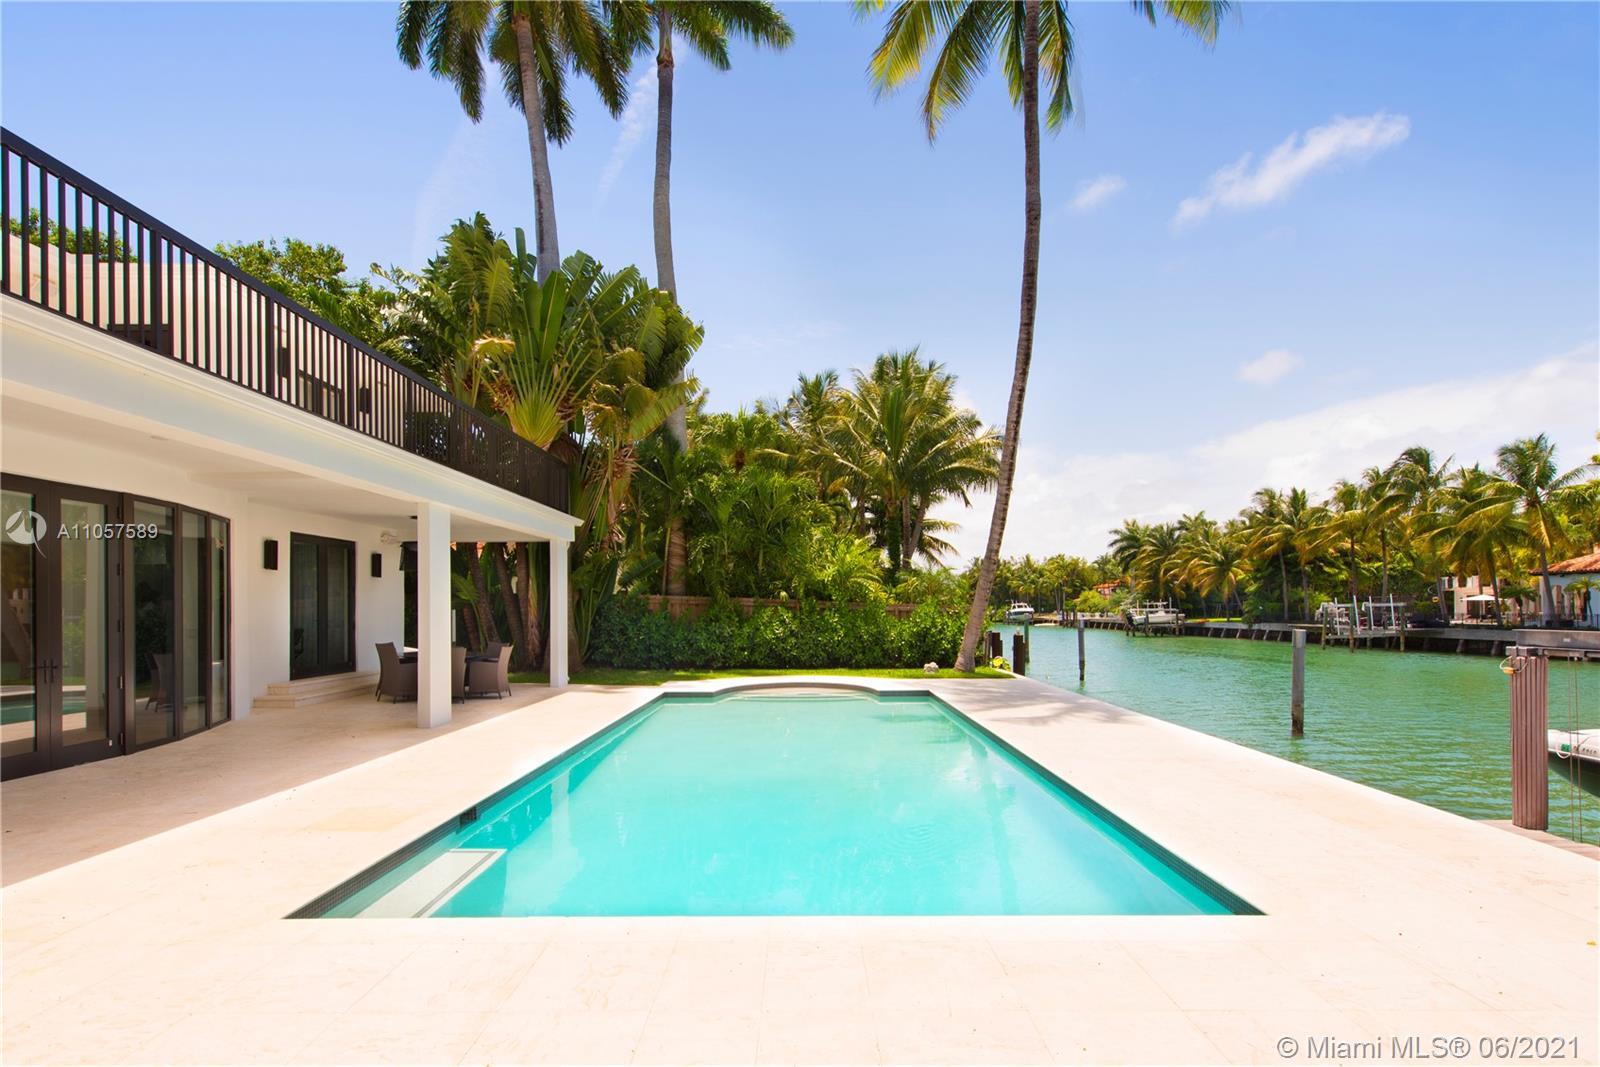 Sunset Islands - 1611 W 24th St, Miami Beach, FL 33140